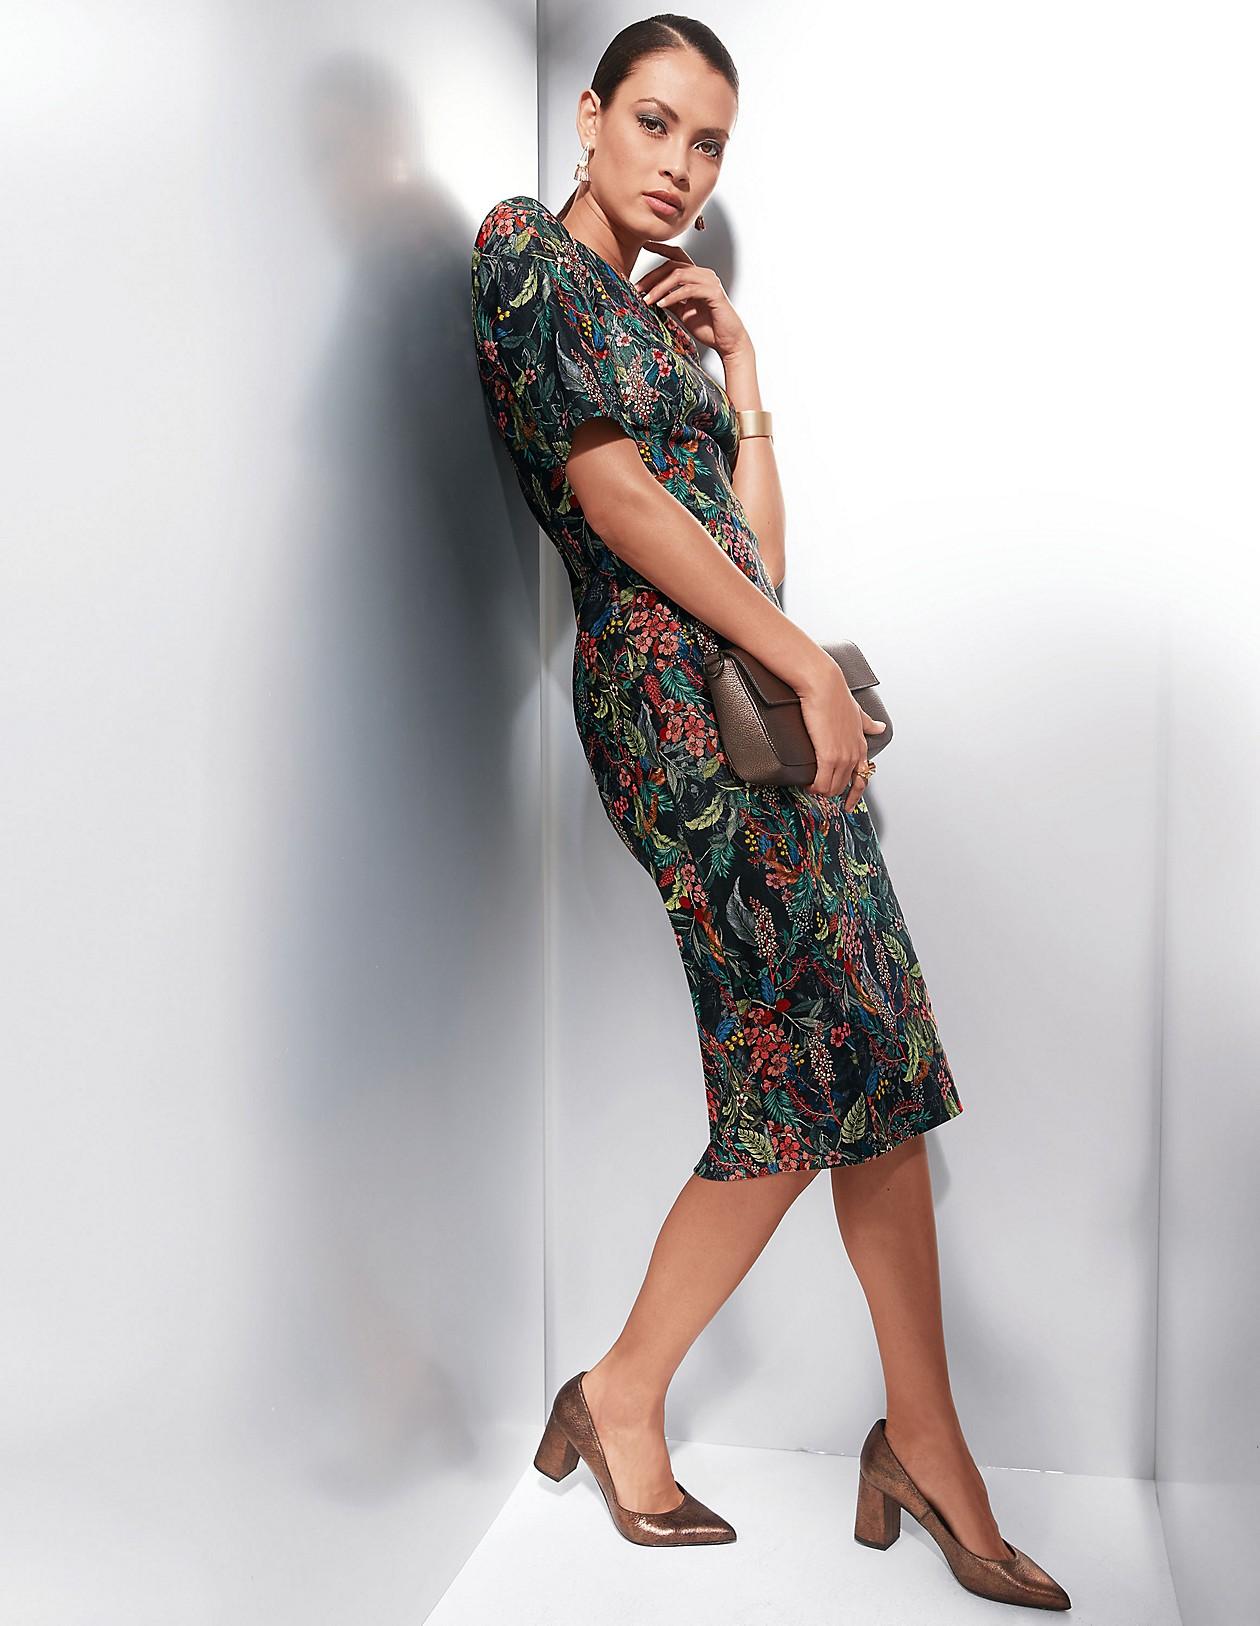 ec7d29e75b8c9c Etui-Kleid mit Floral-Dessin, schwarz/multicolor, blau, rot, schwarz |  MADELEINE Mode